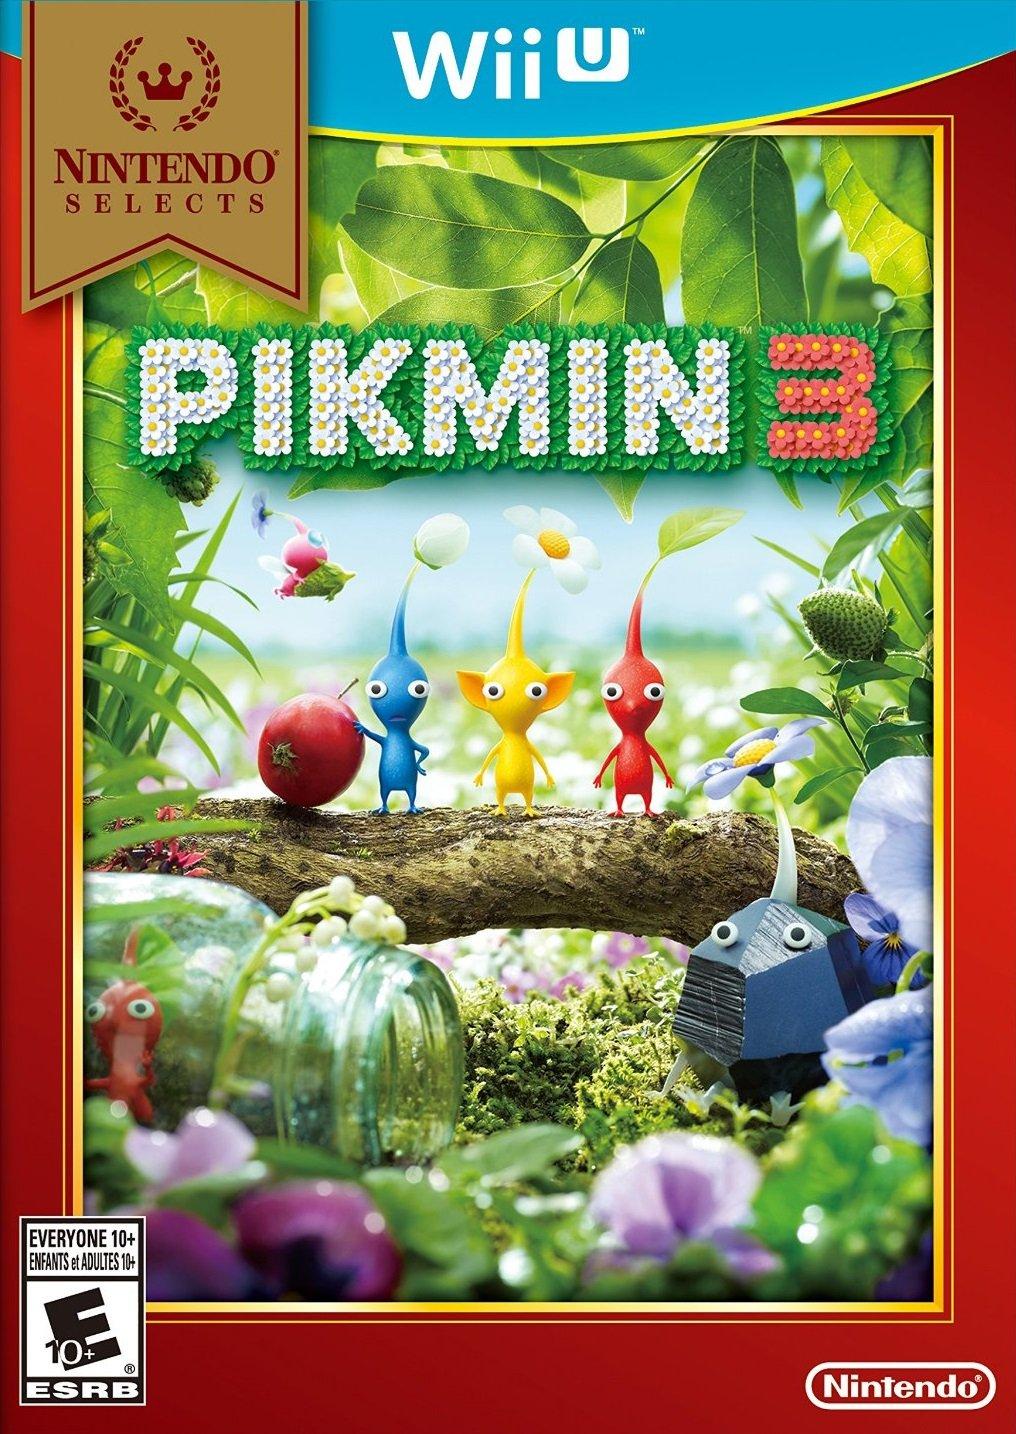 How to redeem your download code for nintendo wii u - Nintendo Selects Pikmin 3 Wii U Digital Code